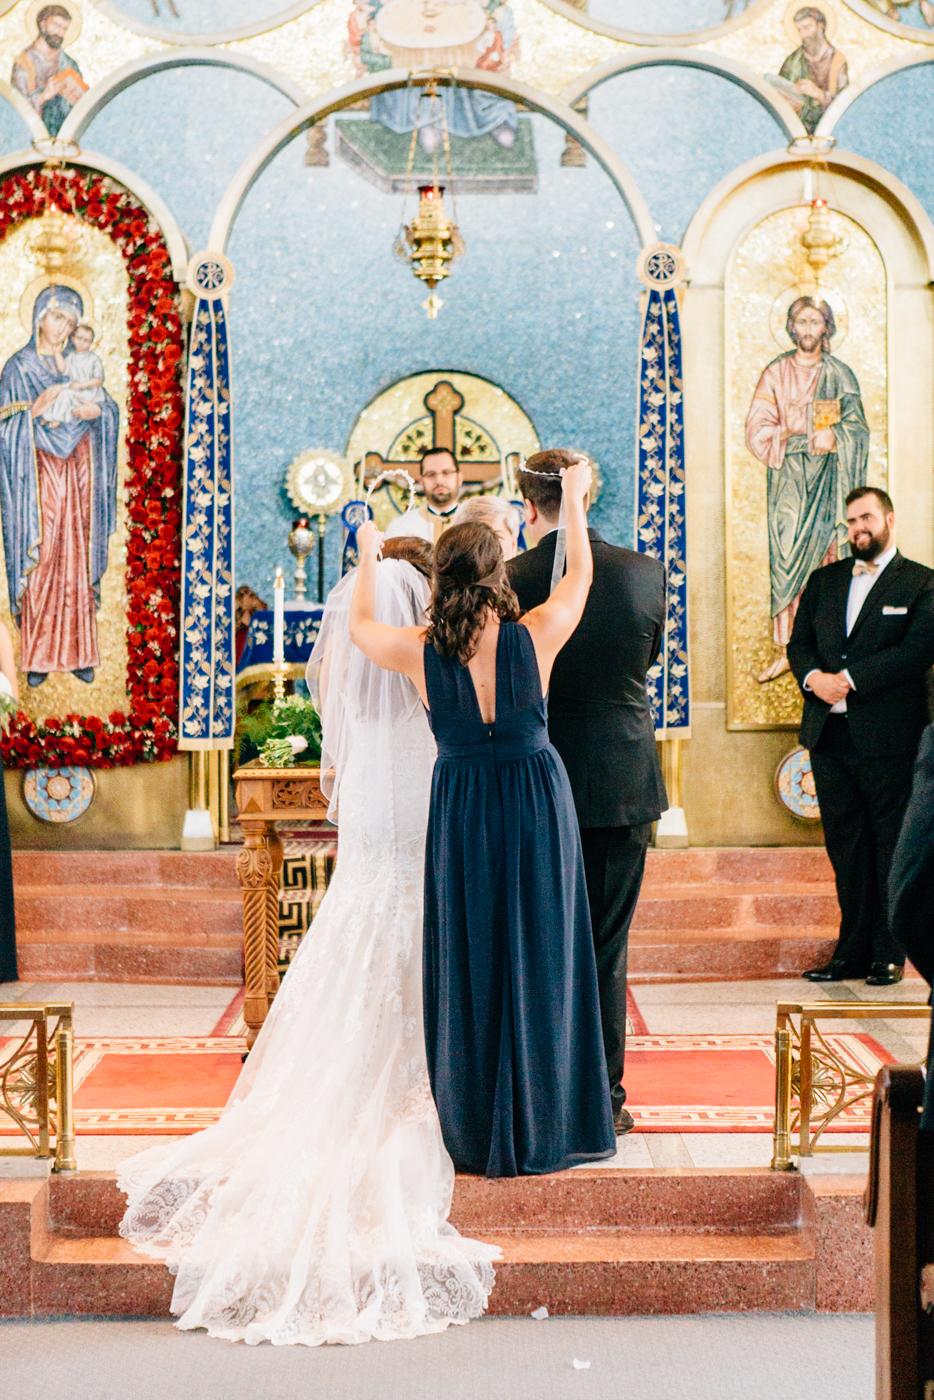 four corners photography greek wedding atlanta greek wedding photographer Annunciation Greek Orthodox Cathedral atlanta wedding photographer (27 of 69).jpg